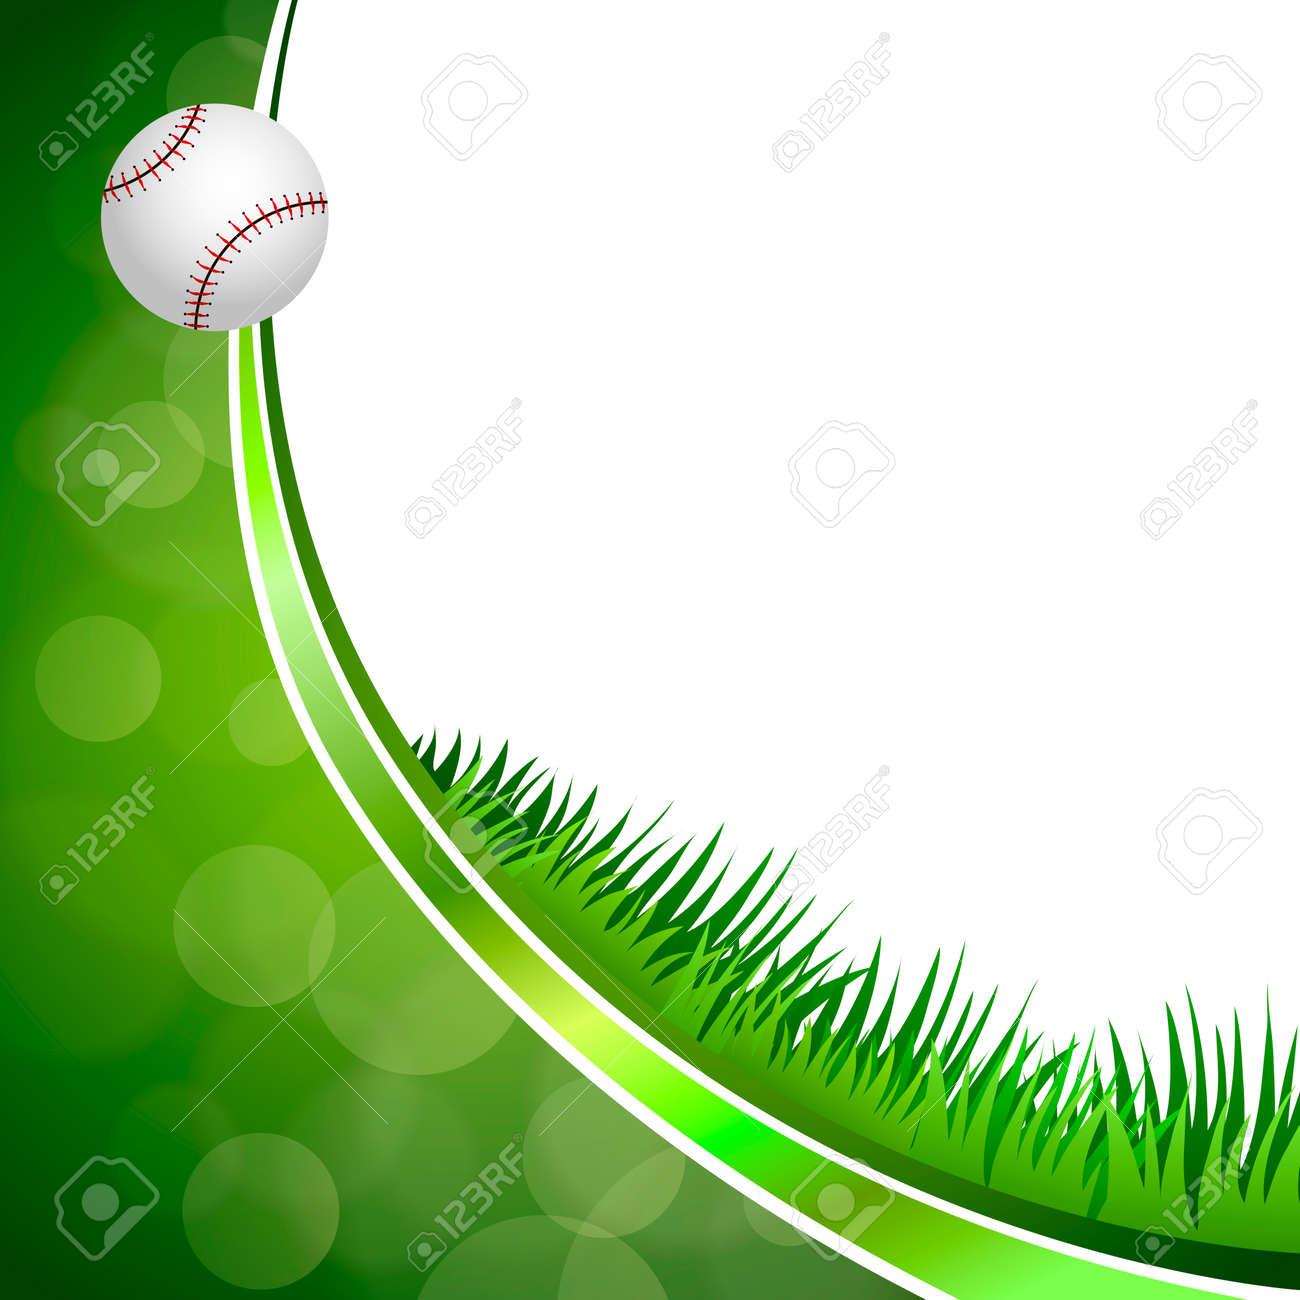 c954efd74ec2 Background abstract green baseball ball circle ribbon frame illustration  vector Stock Vector - 47827889